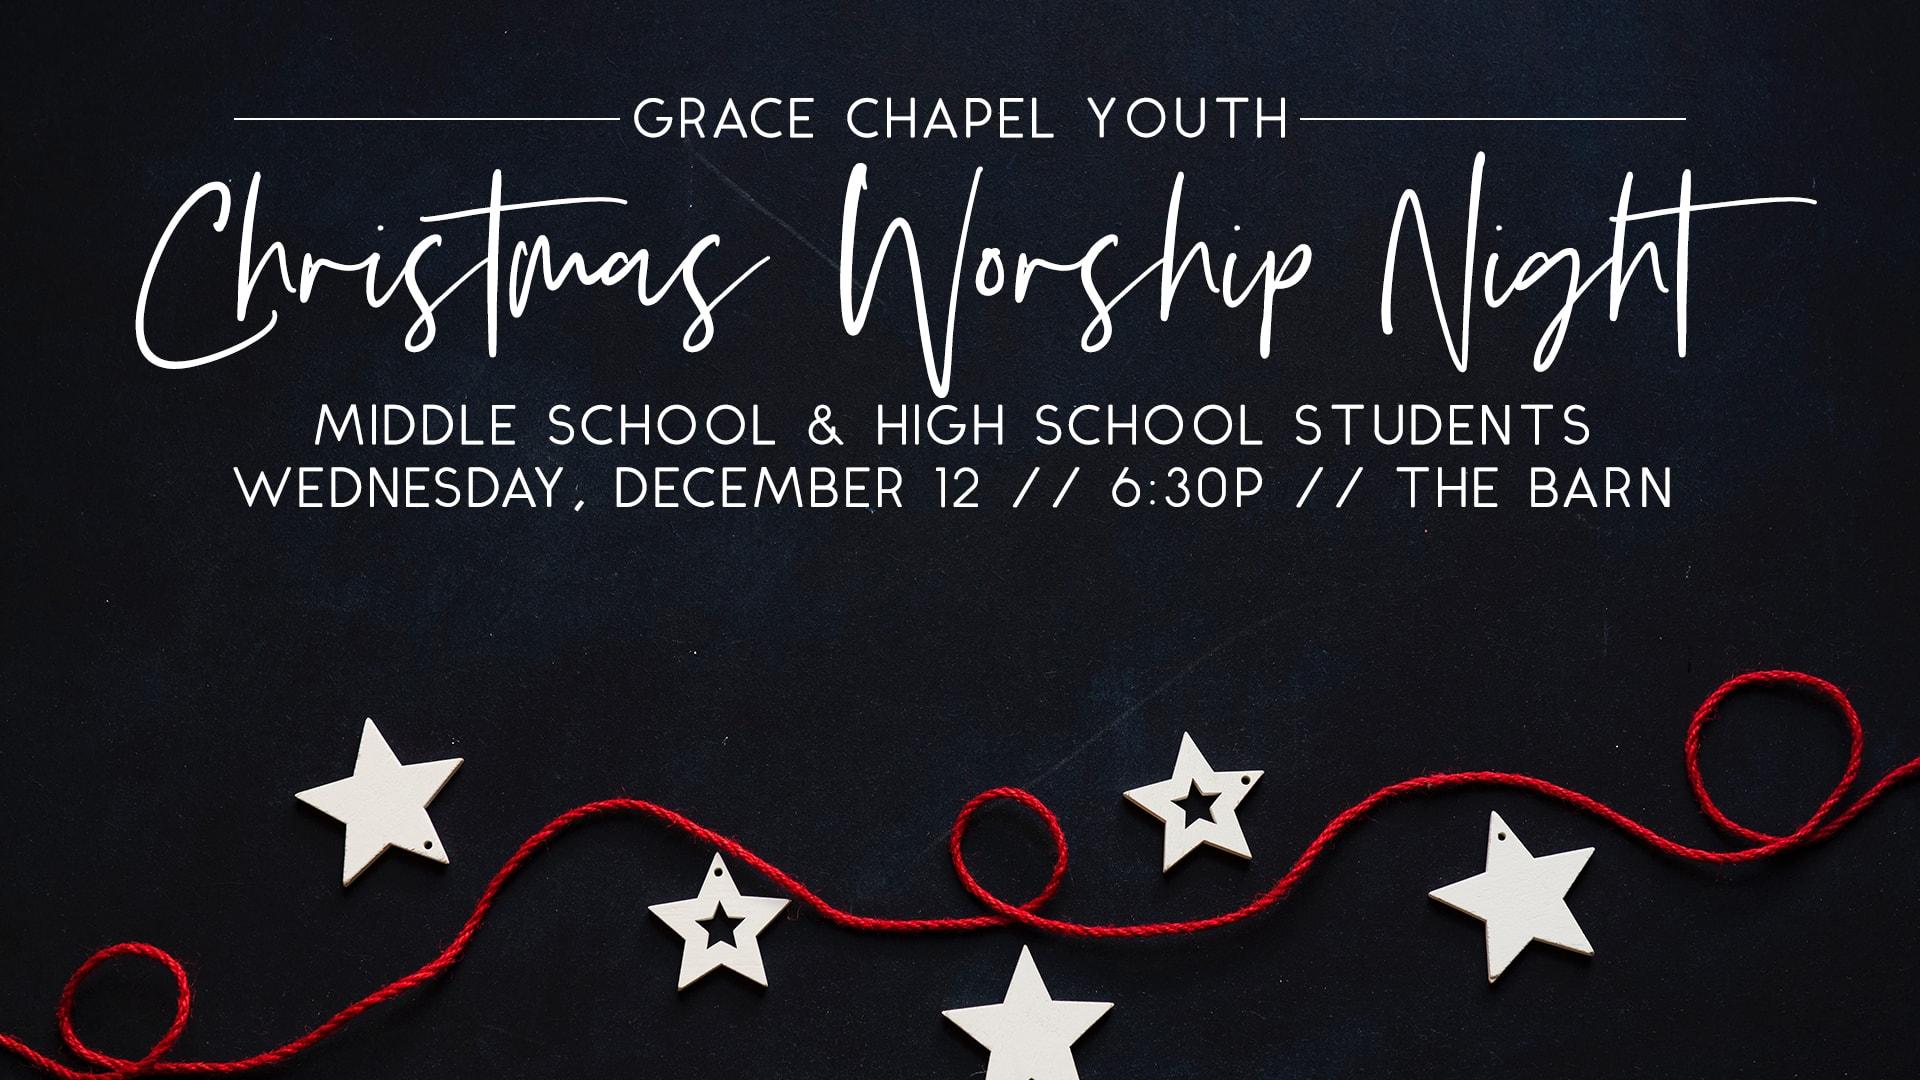 HSM MSM worship night